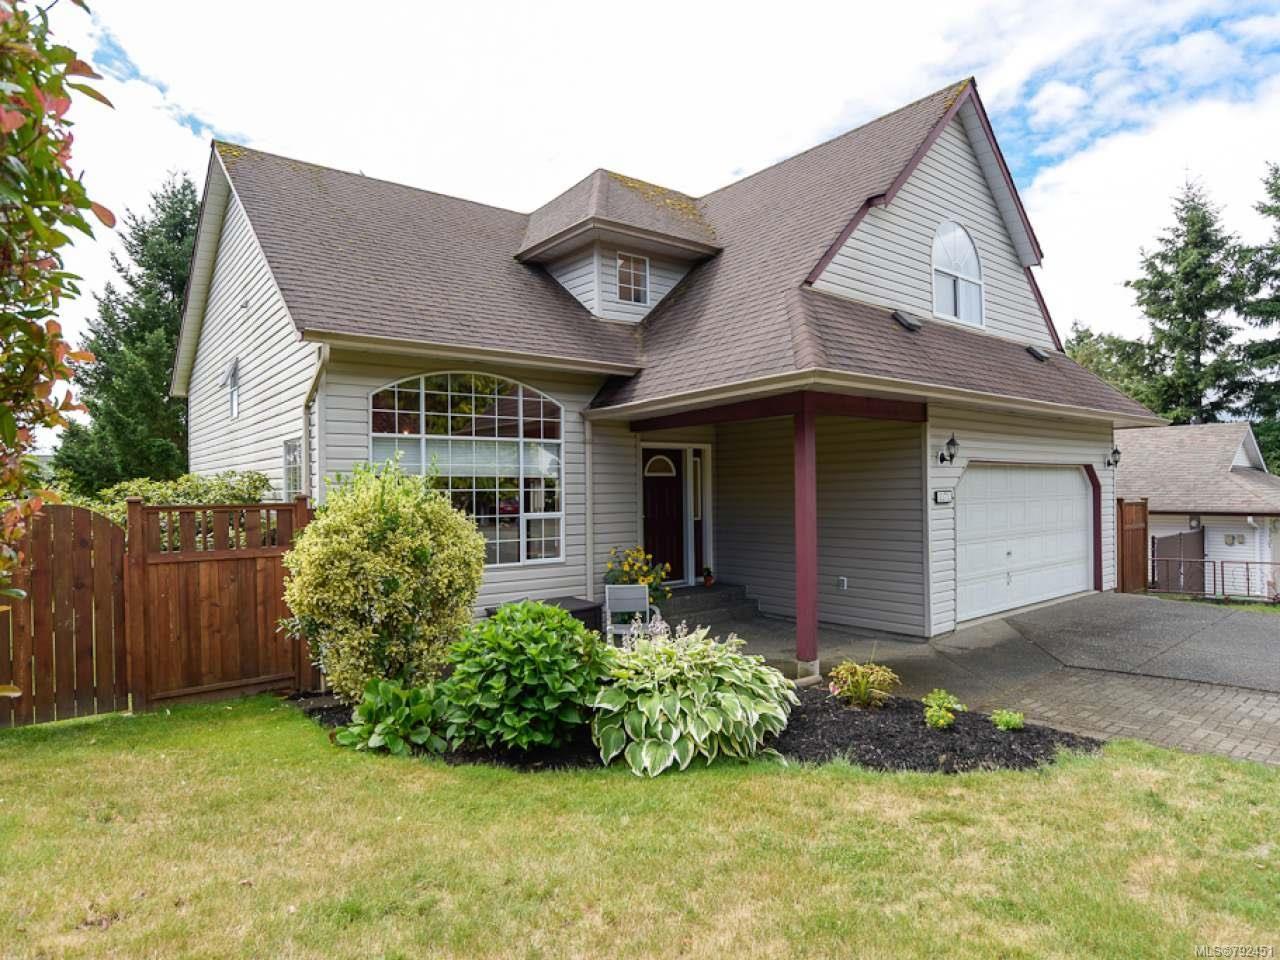 Main Photo: 1171 ZEBALLOS DRIVE in COURTENAY: CV Courtenay East House for sale (Comox Valley)  : MLS®# 792451